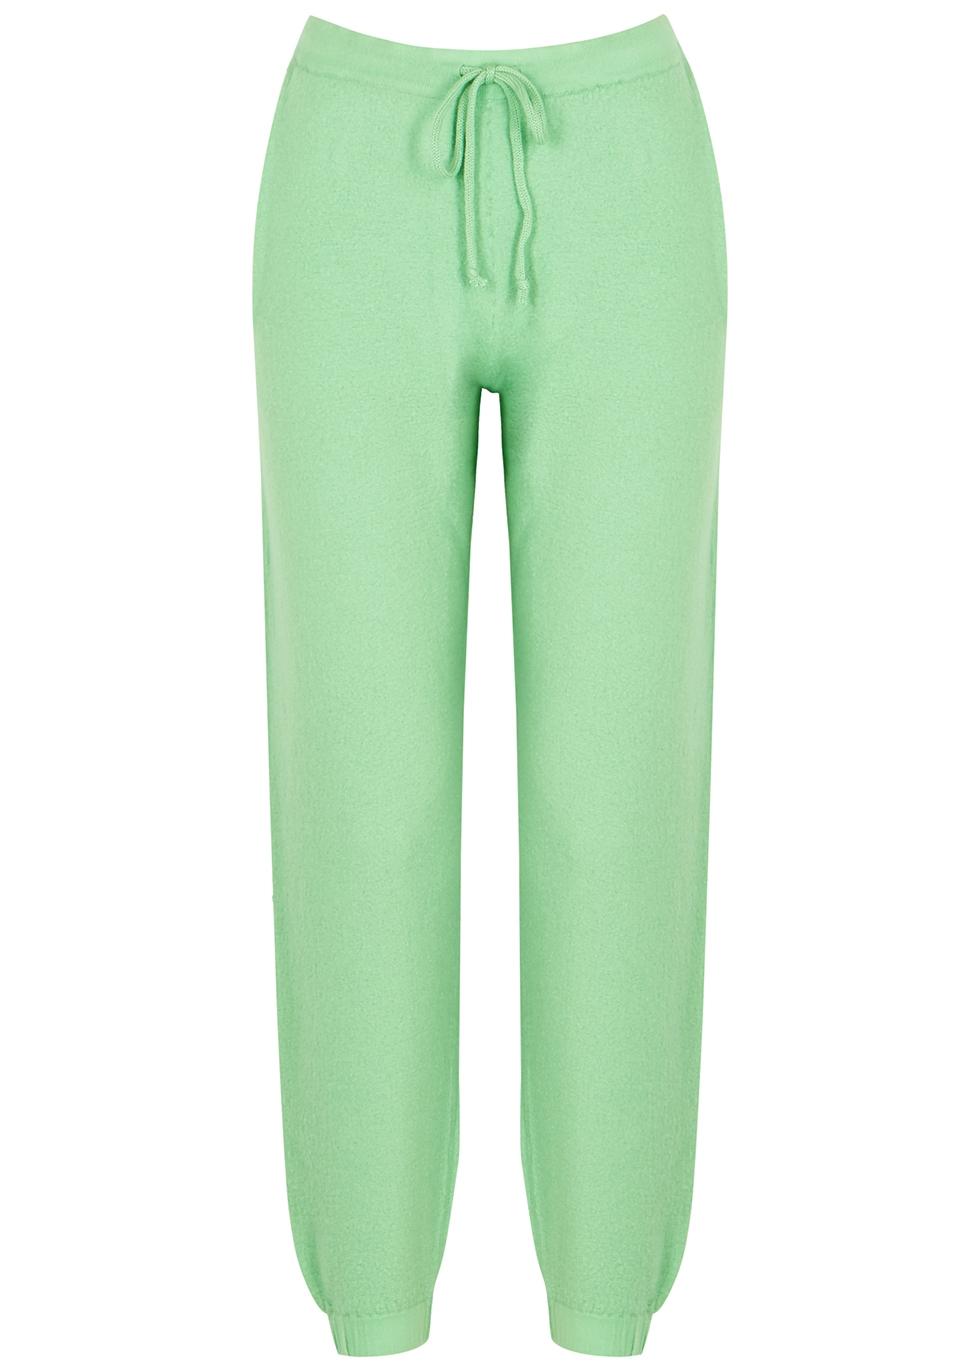 Tadbow green merino wool sweatpants